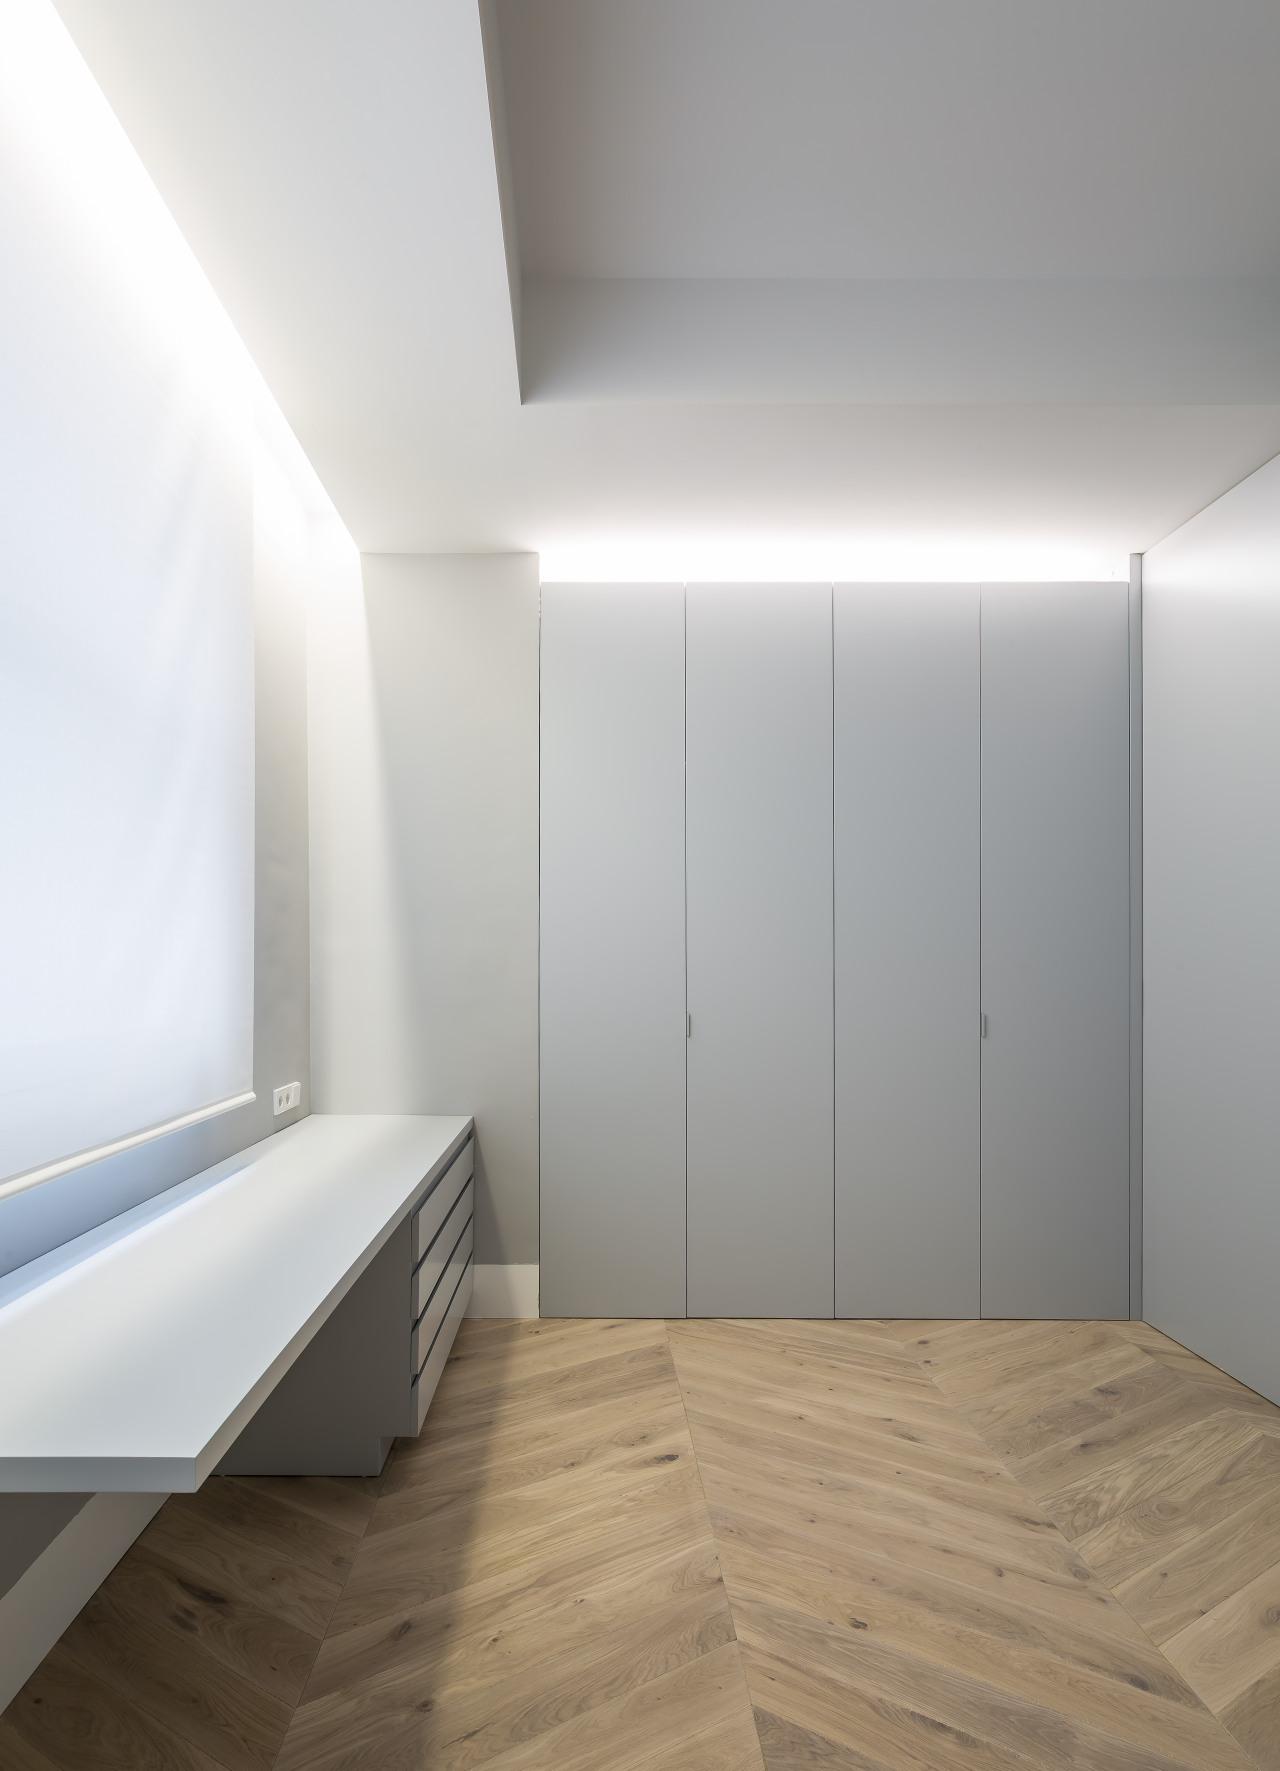 fotografia-arquitectura-valencia-german-cabo-gallardo-llopis-bfm-edificatoria-turia01 (12)